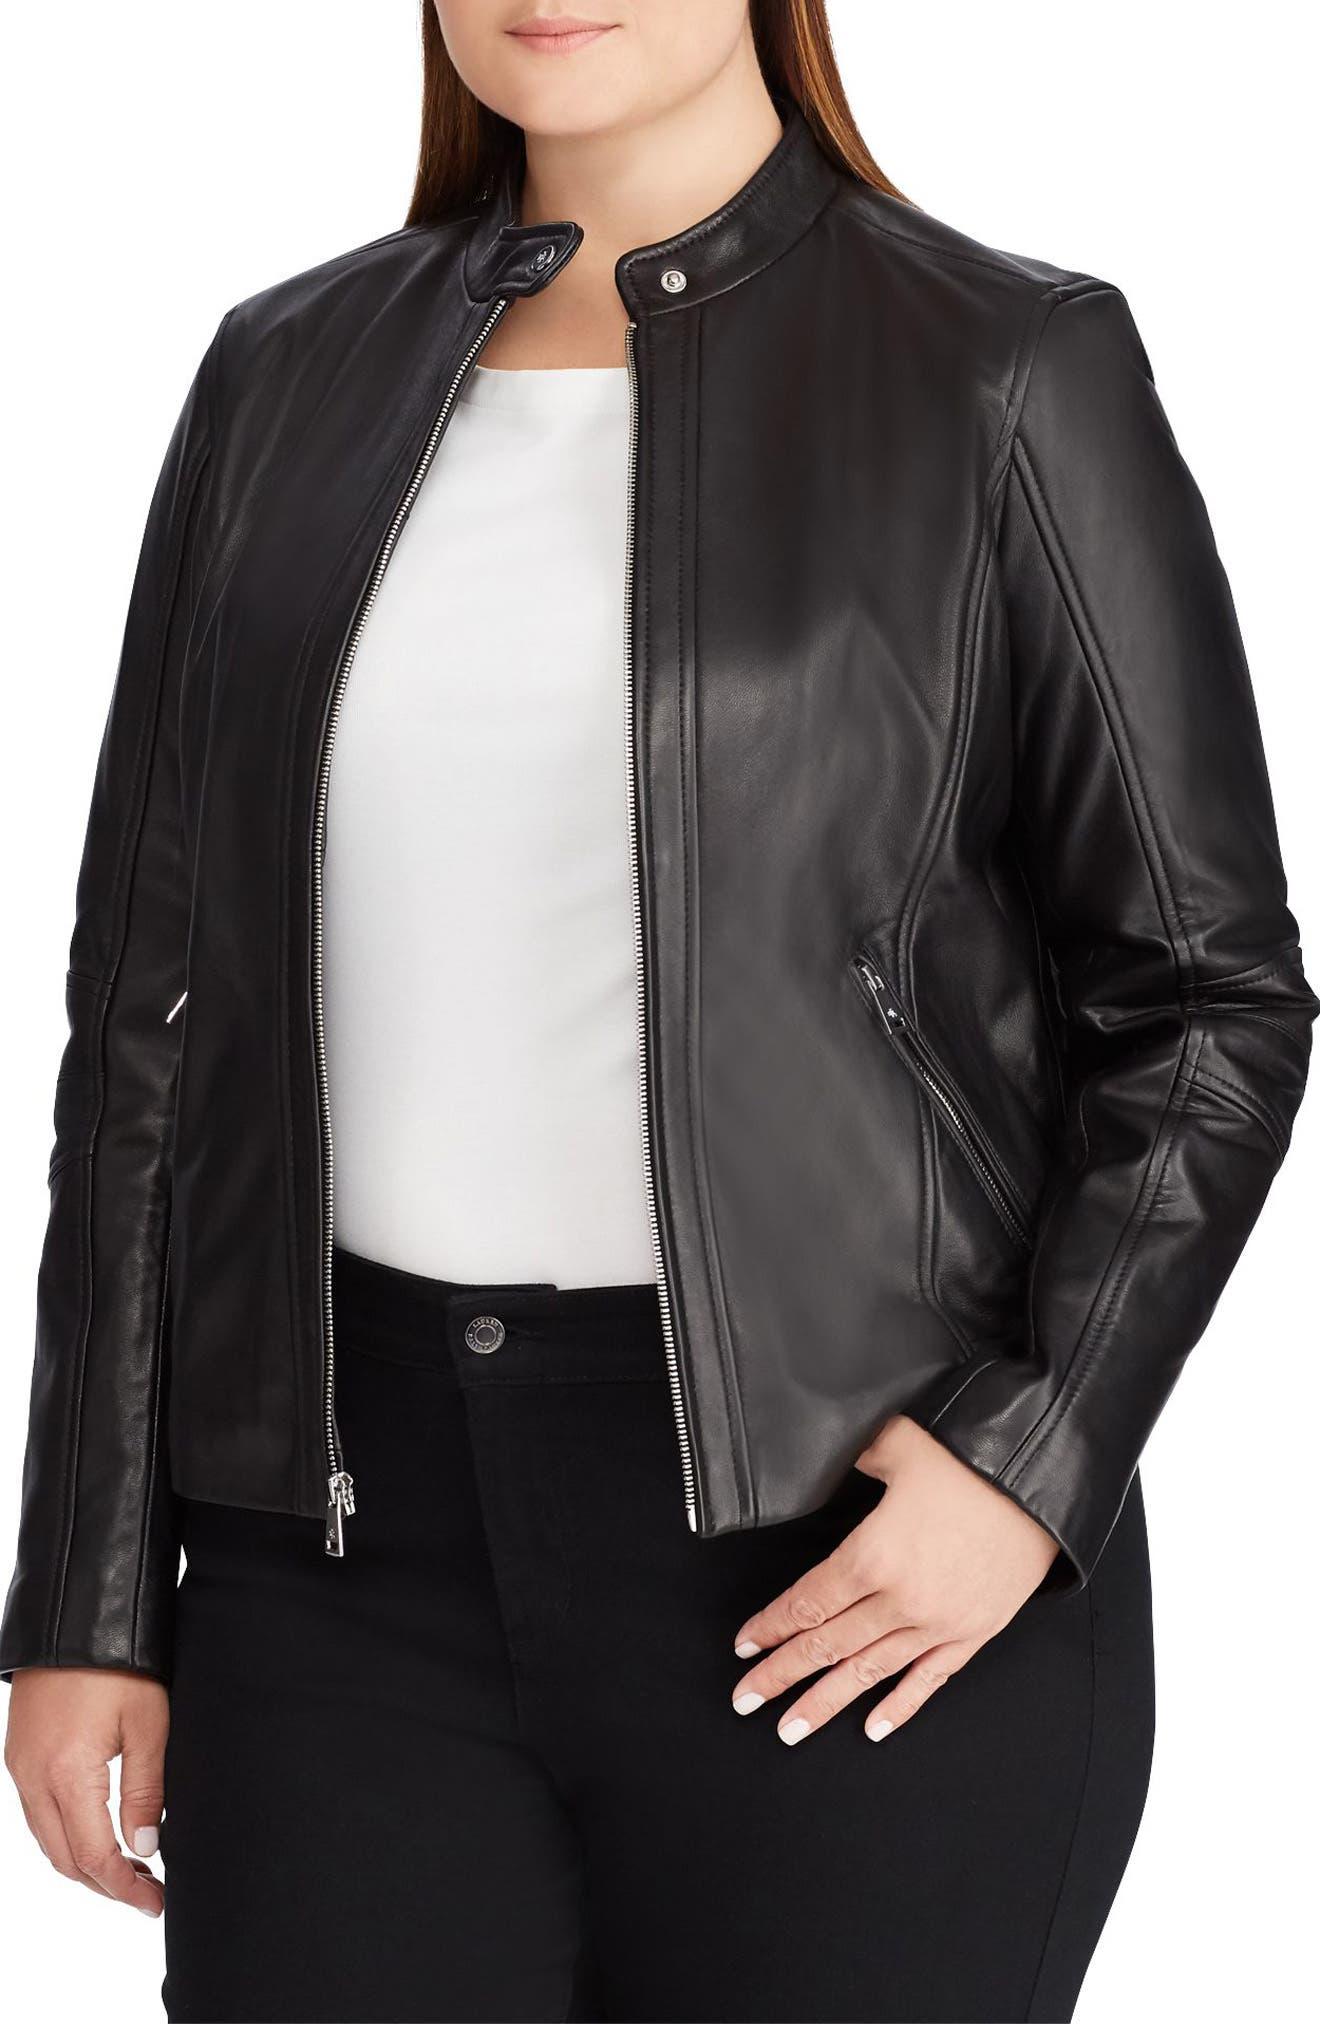 LAUREN RALPH LAUREN,                             Leather Moto Jacket,                             Main thumbnail 1, color,                             005